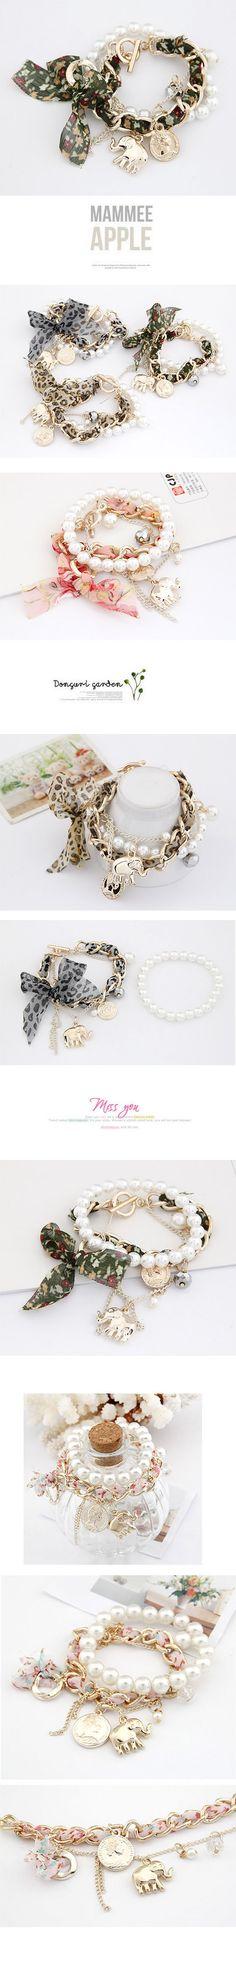 Urban Green Bow Elephant Design Lace Korean Fashion Bracelet http://www.asujewelry.com/